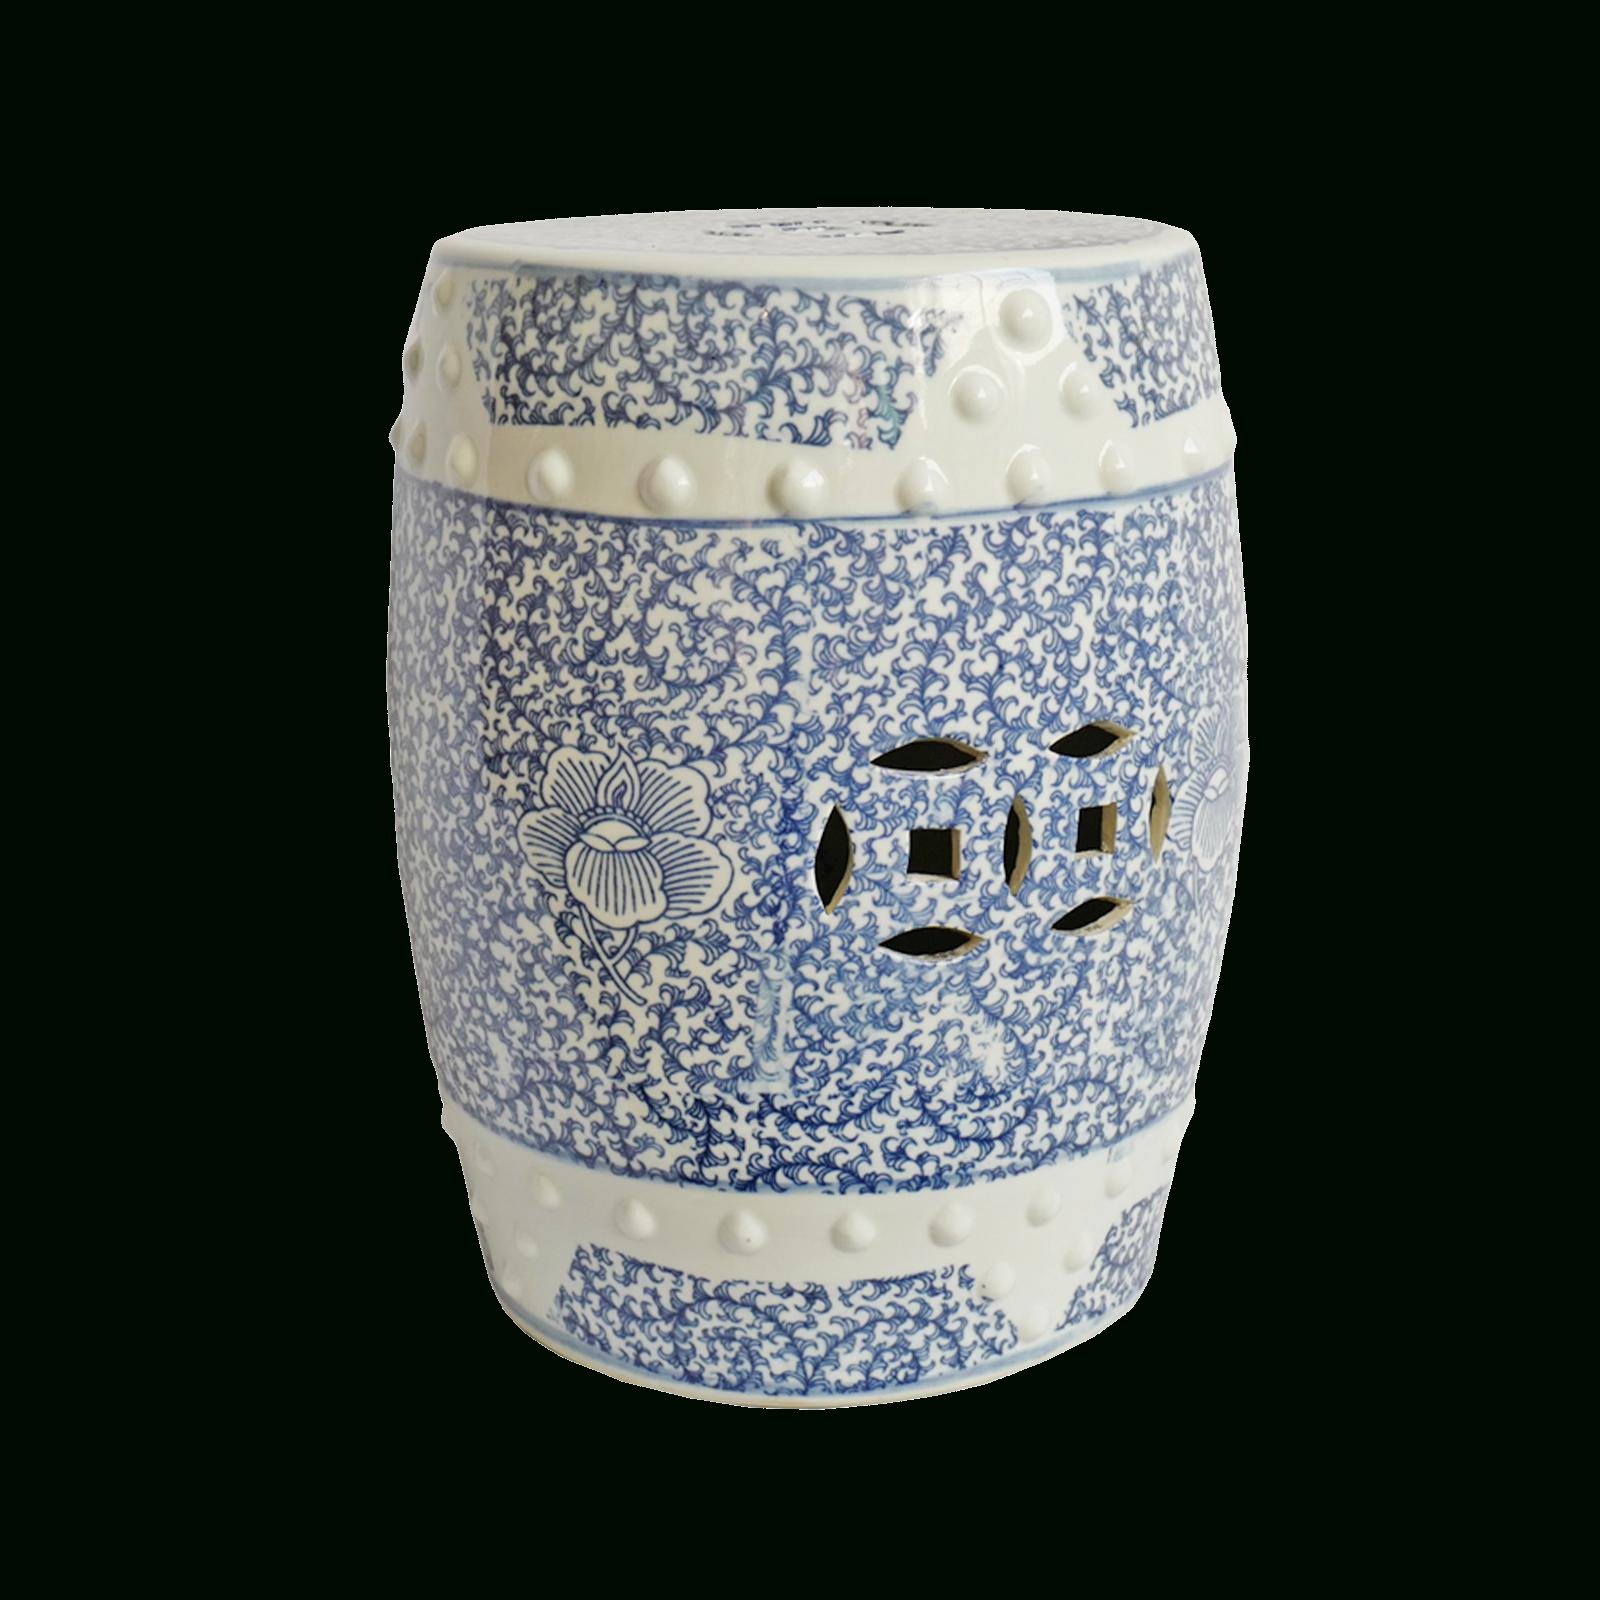 Safavieh Paradise Swallows White Ceramic Decorative Garden Within Holbæk Garden Stools (View 20 of 25)